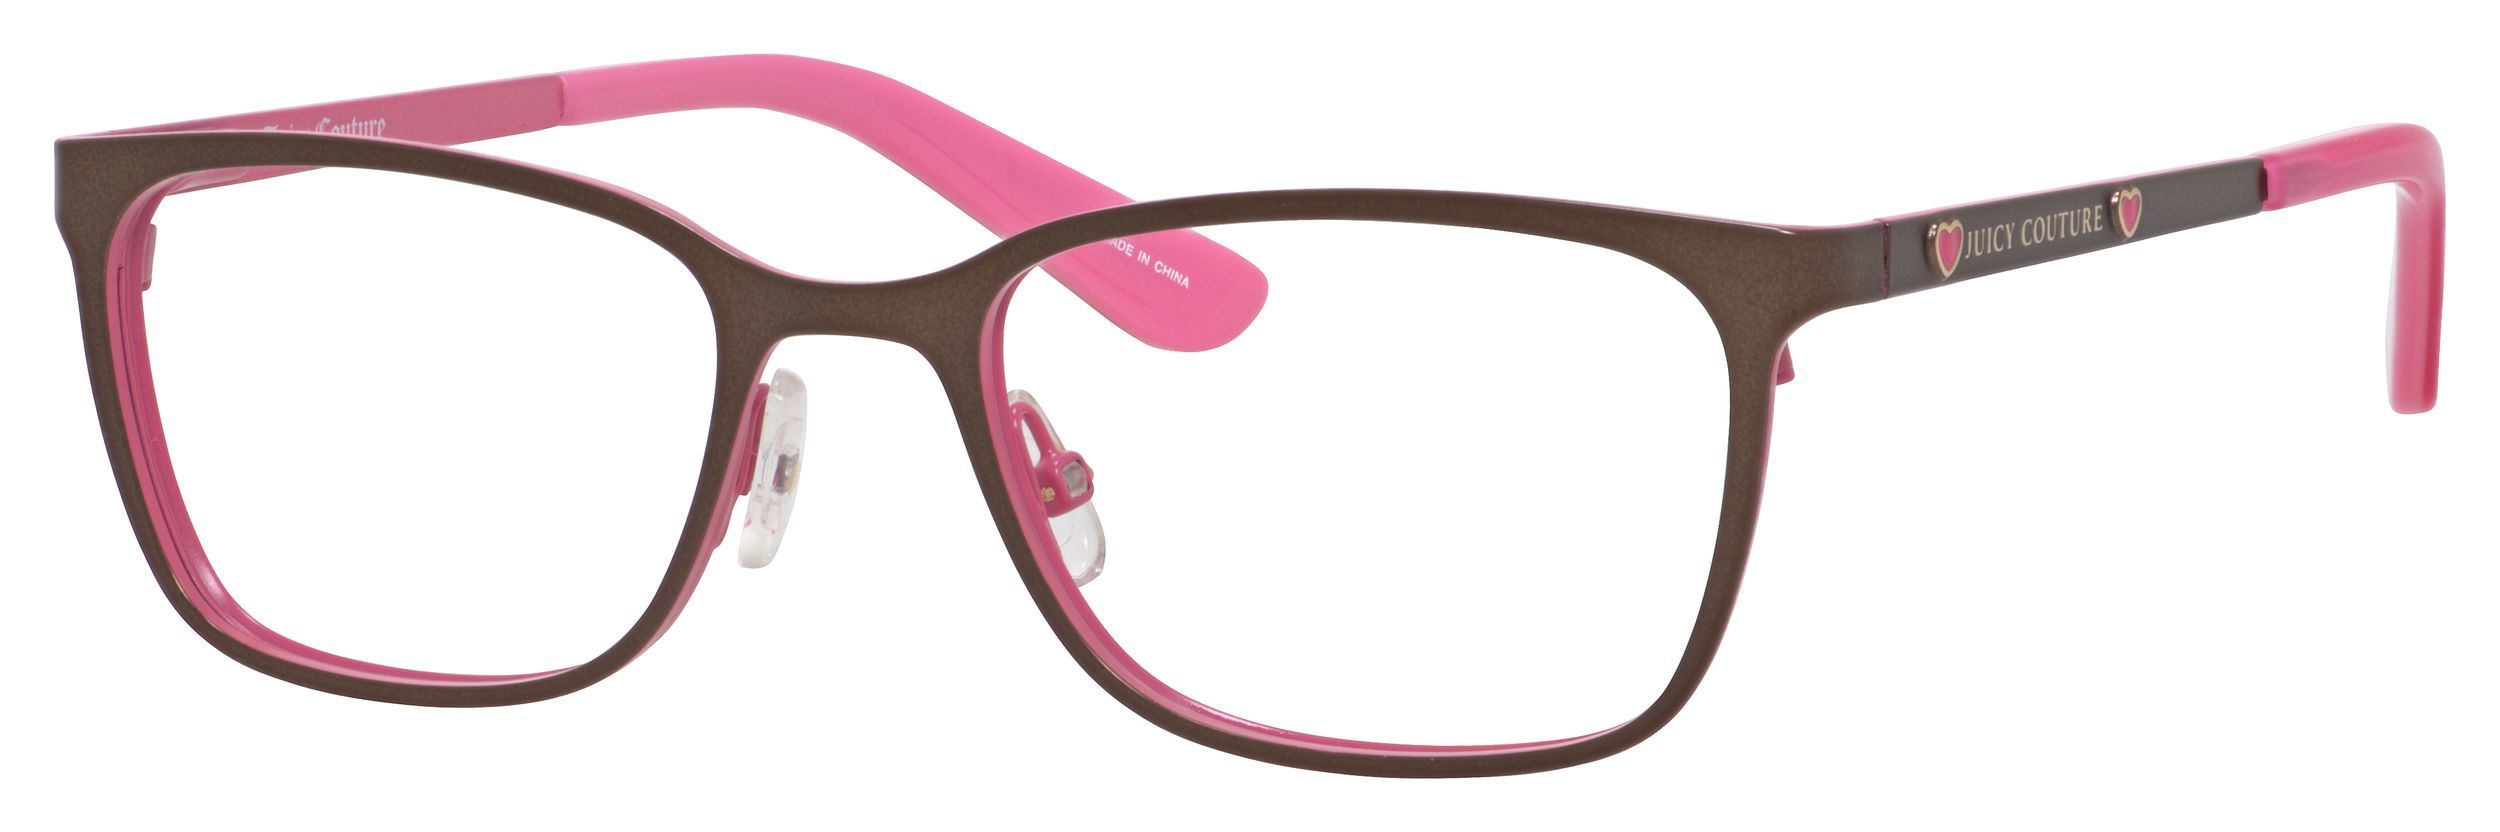 b6344c2053a Eyewear for Kids - Girl Brown 6-8 years - Optiwow